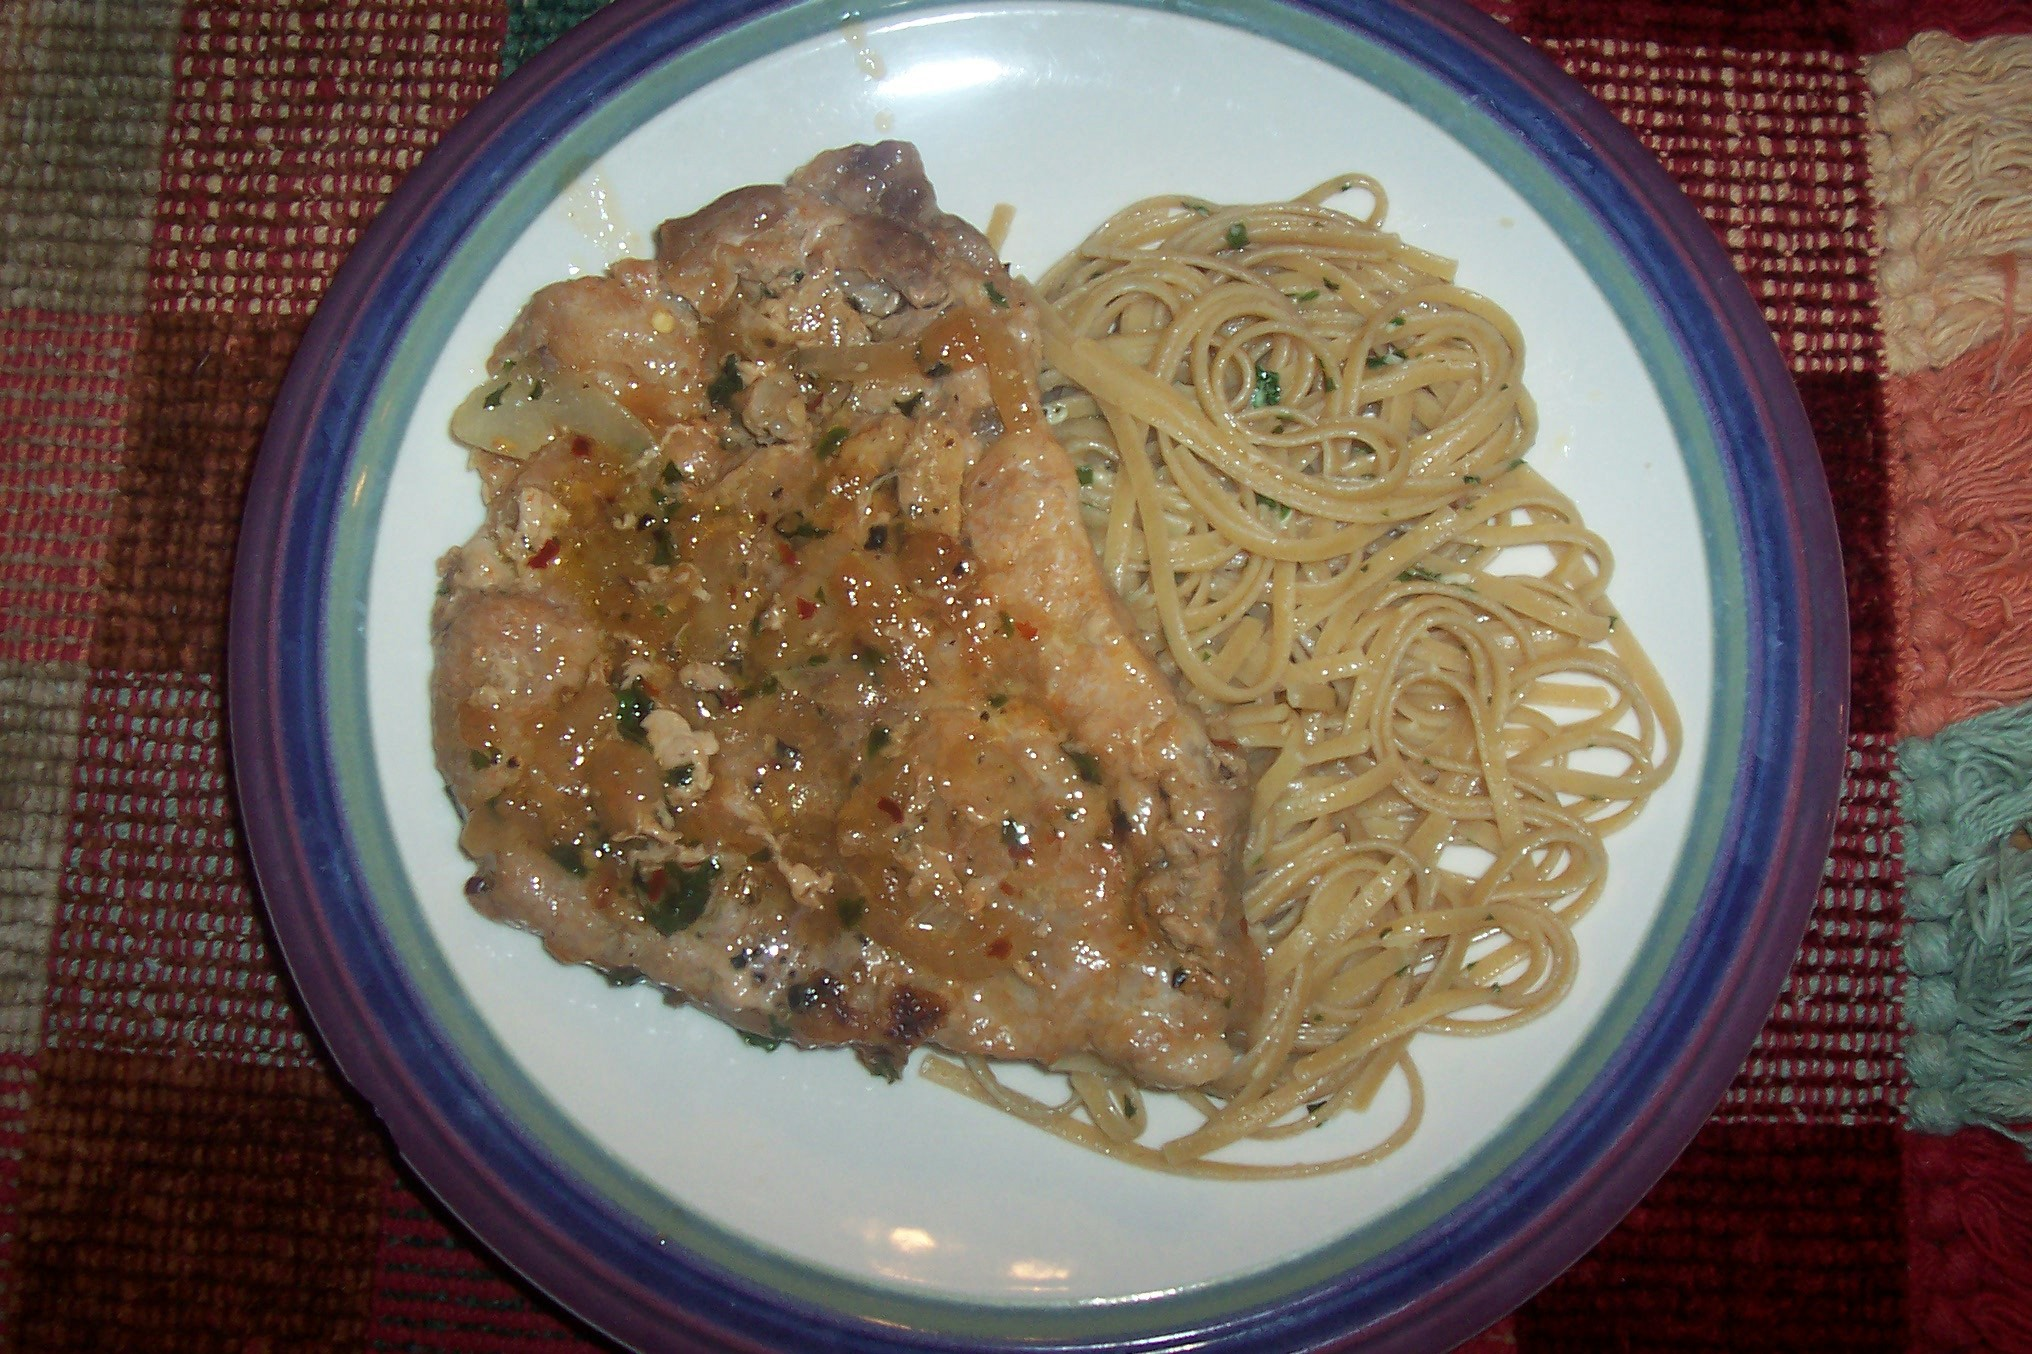 Veronica's Pasta Bianc (Pasta and Pork Chops)